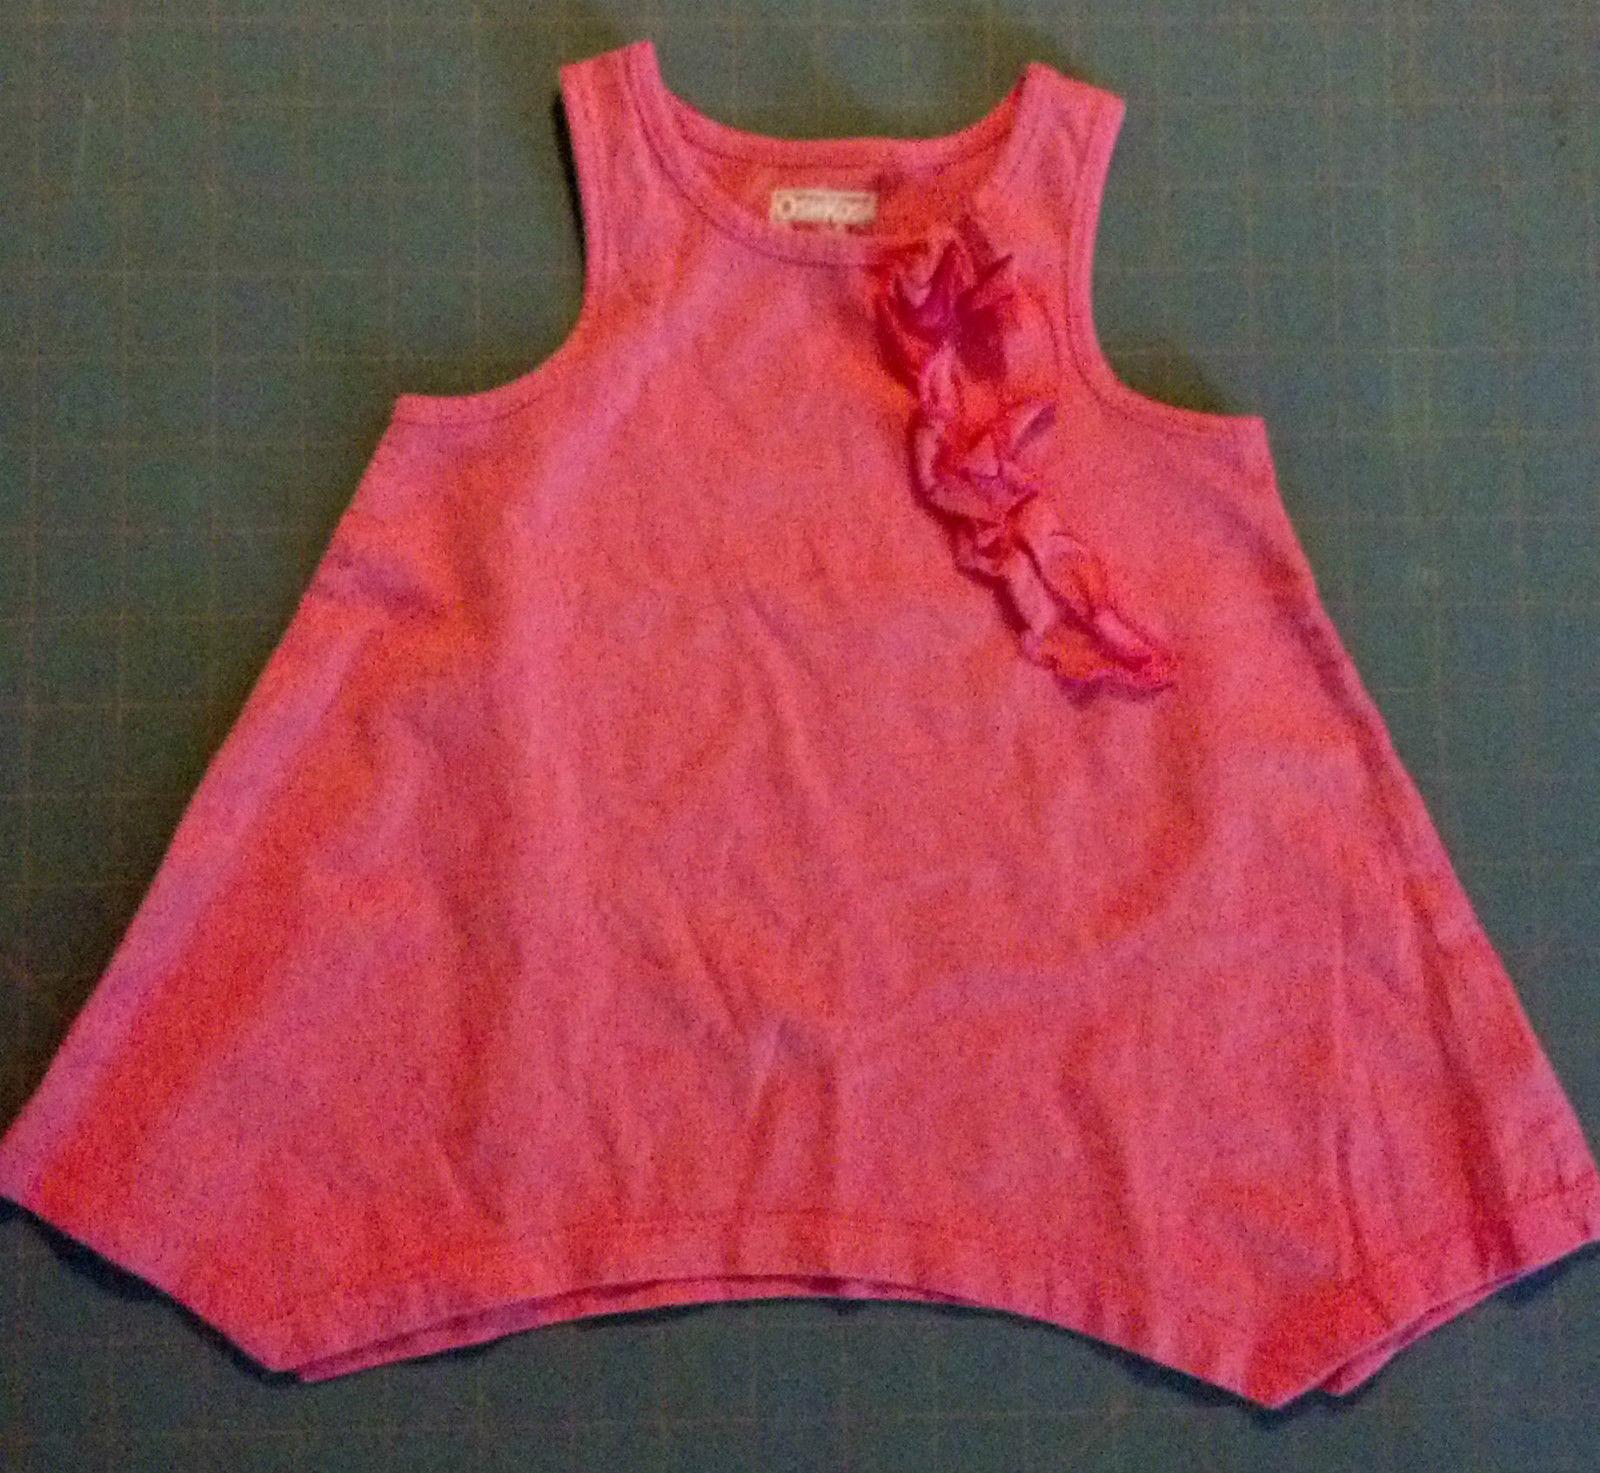 Girl's Size 18 M Months 2 Piece Pink Ruffled Osh Kosh Top & Garanimals Pants